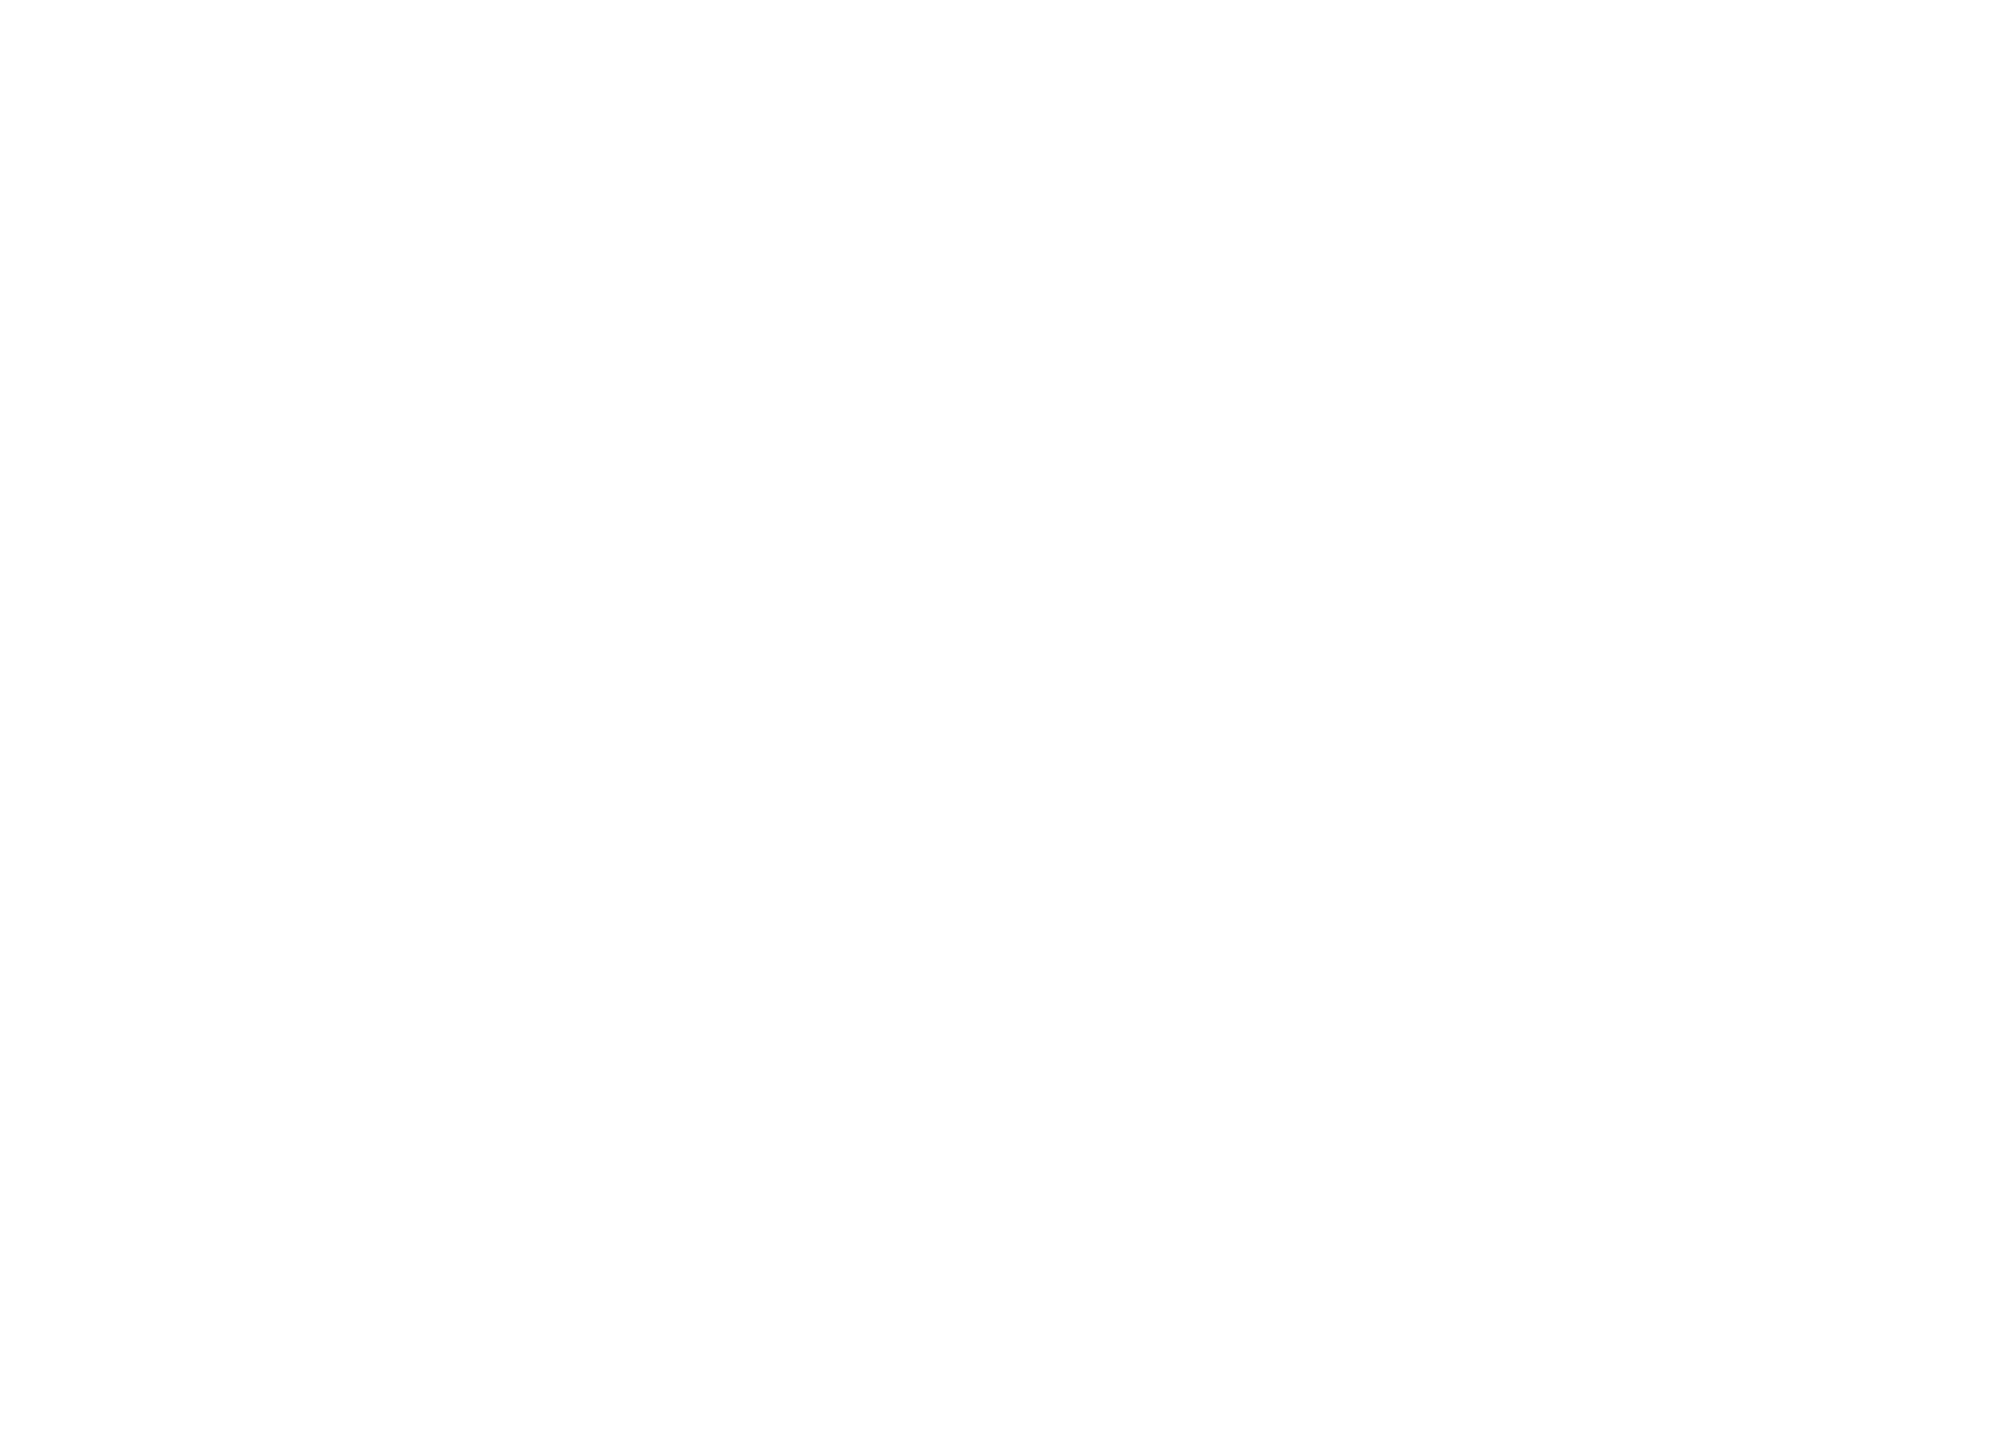 BOIPA logo